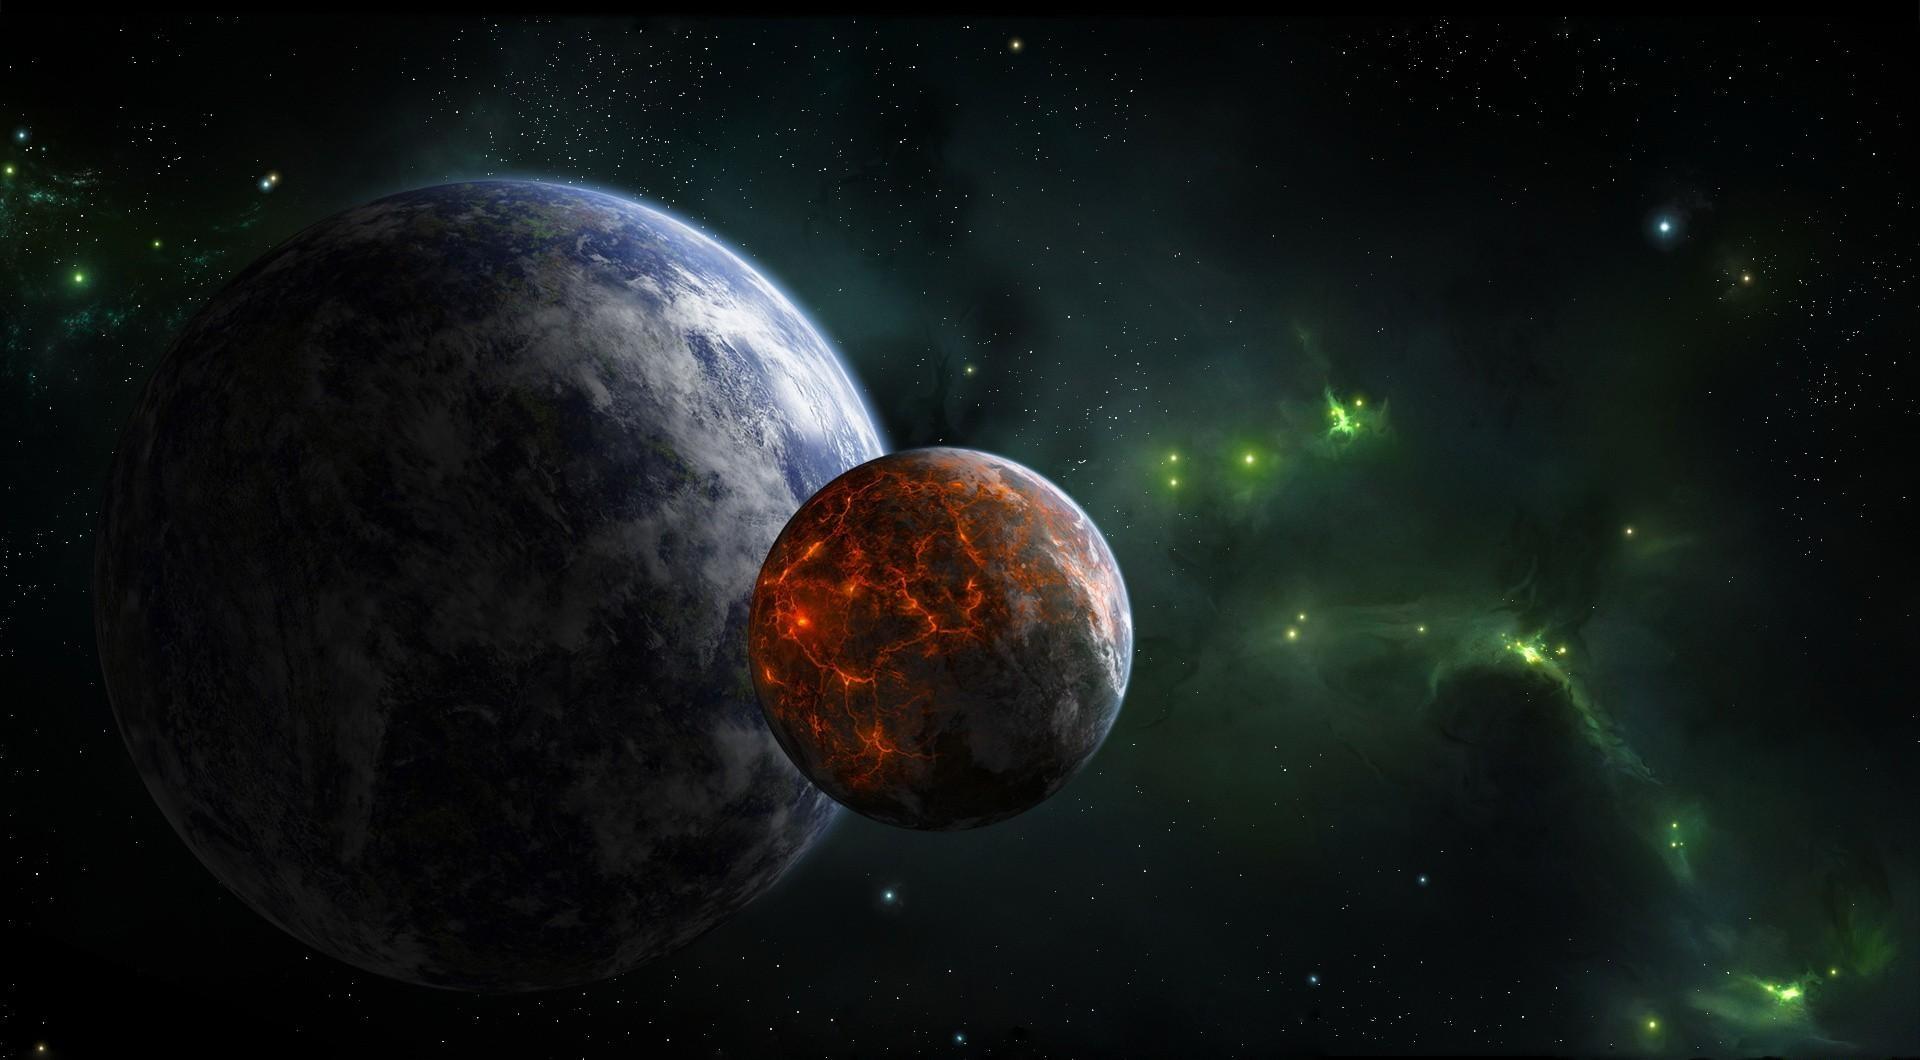 Wallpaper : planet, stars, Earth, nebula, atmosphere ...